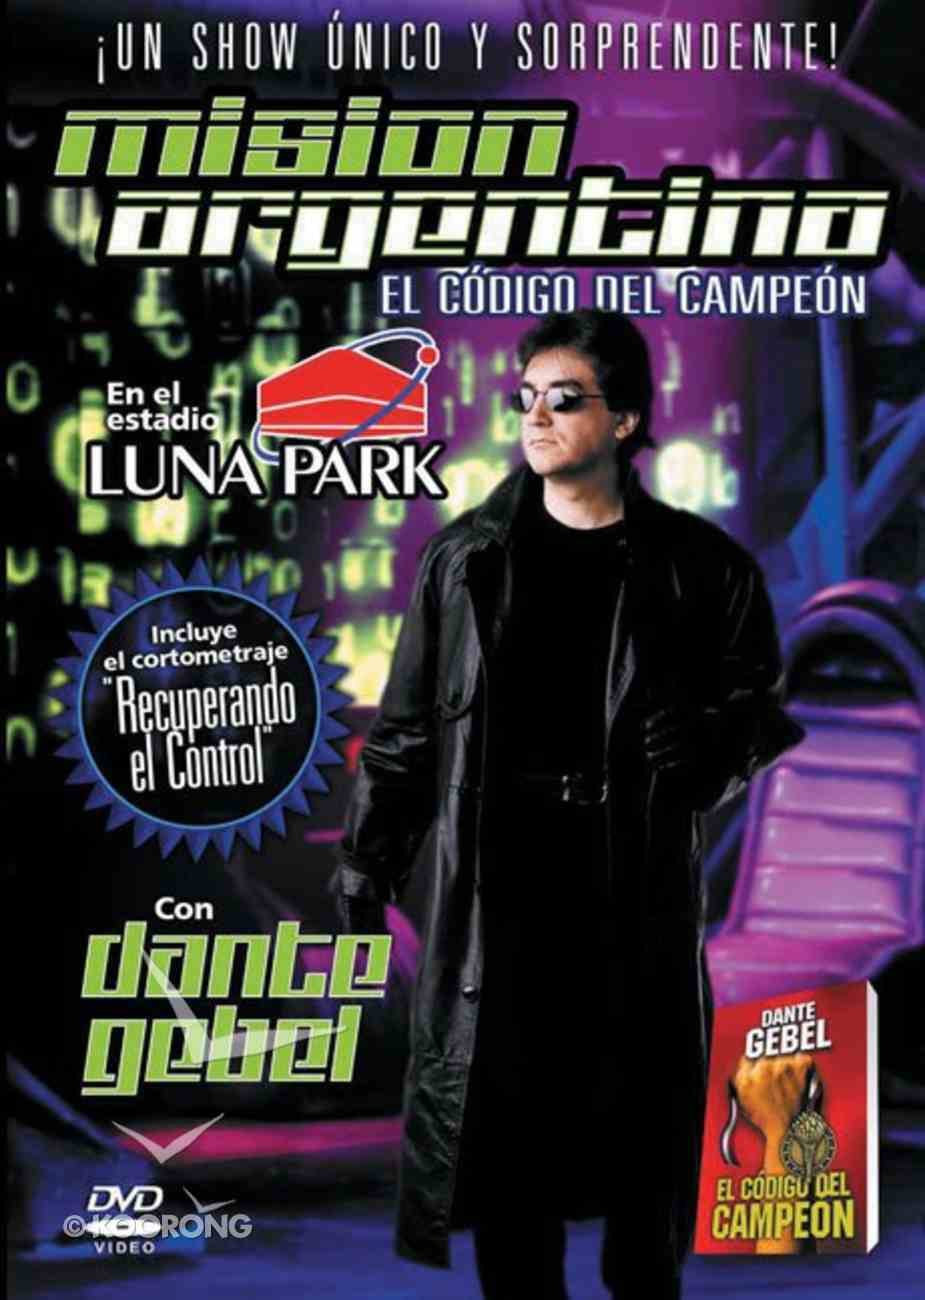 Codigo Del Campeon: Mison Argentina (Champion Code: Argentina Mission) DVD